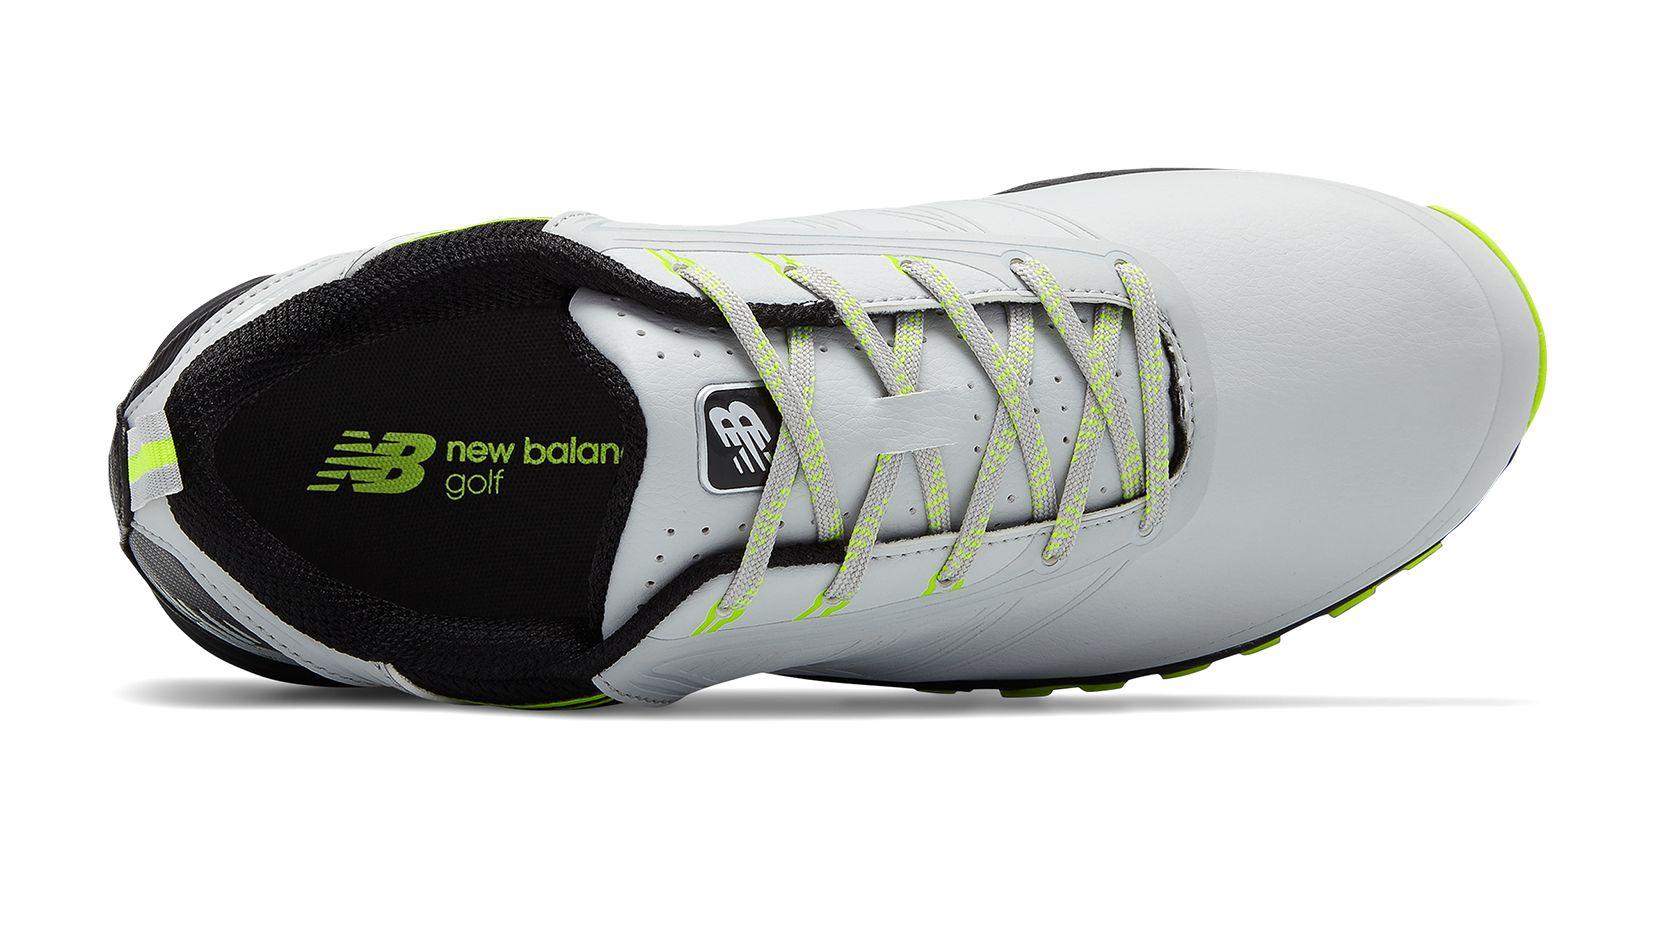 1be2d692 New Balance Minimus SL Golf Shoe - Review Thread